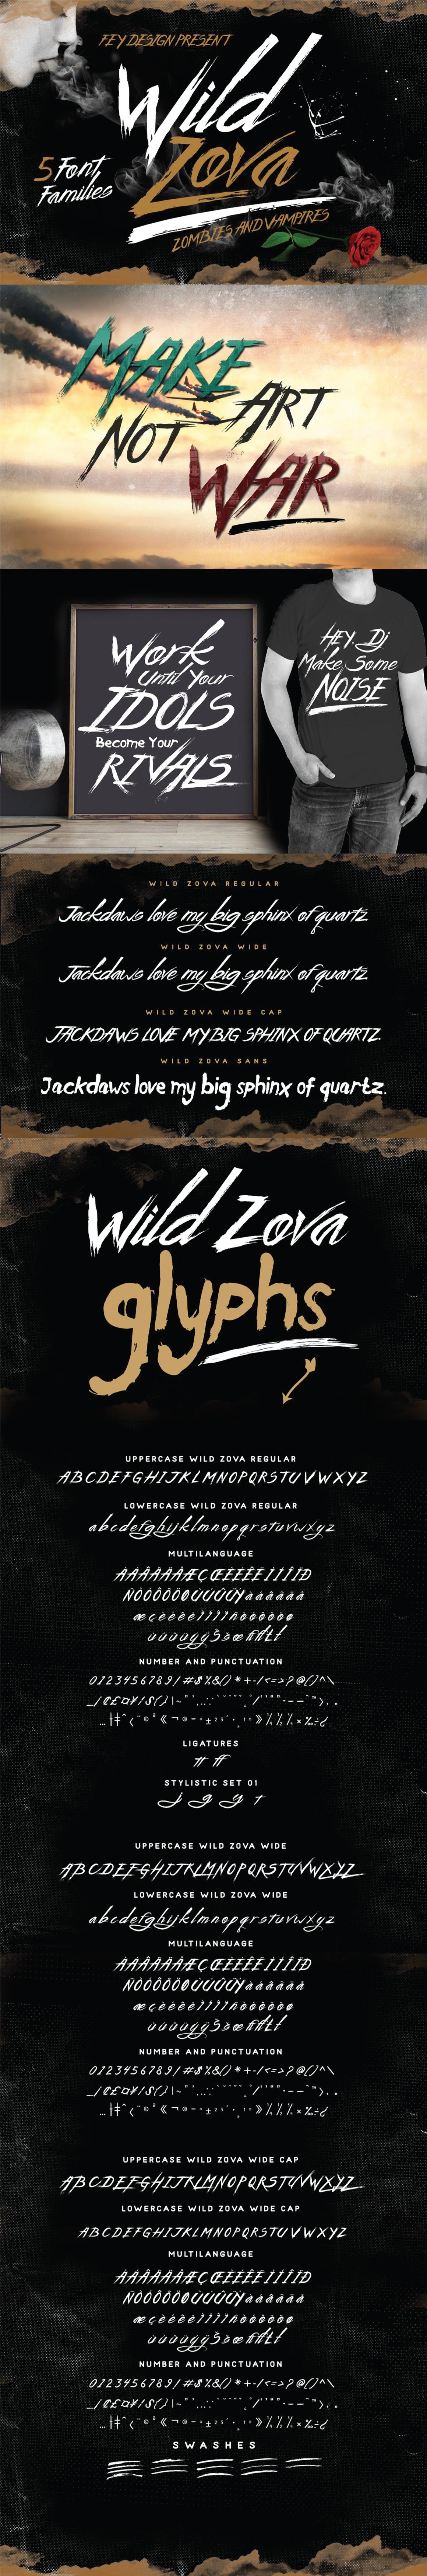 Wild-Zova-Long.jpg